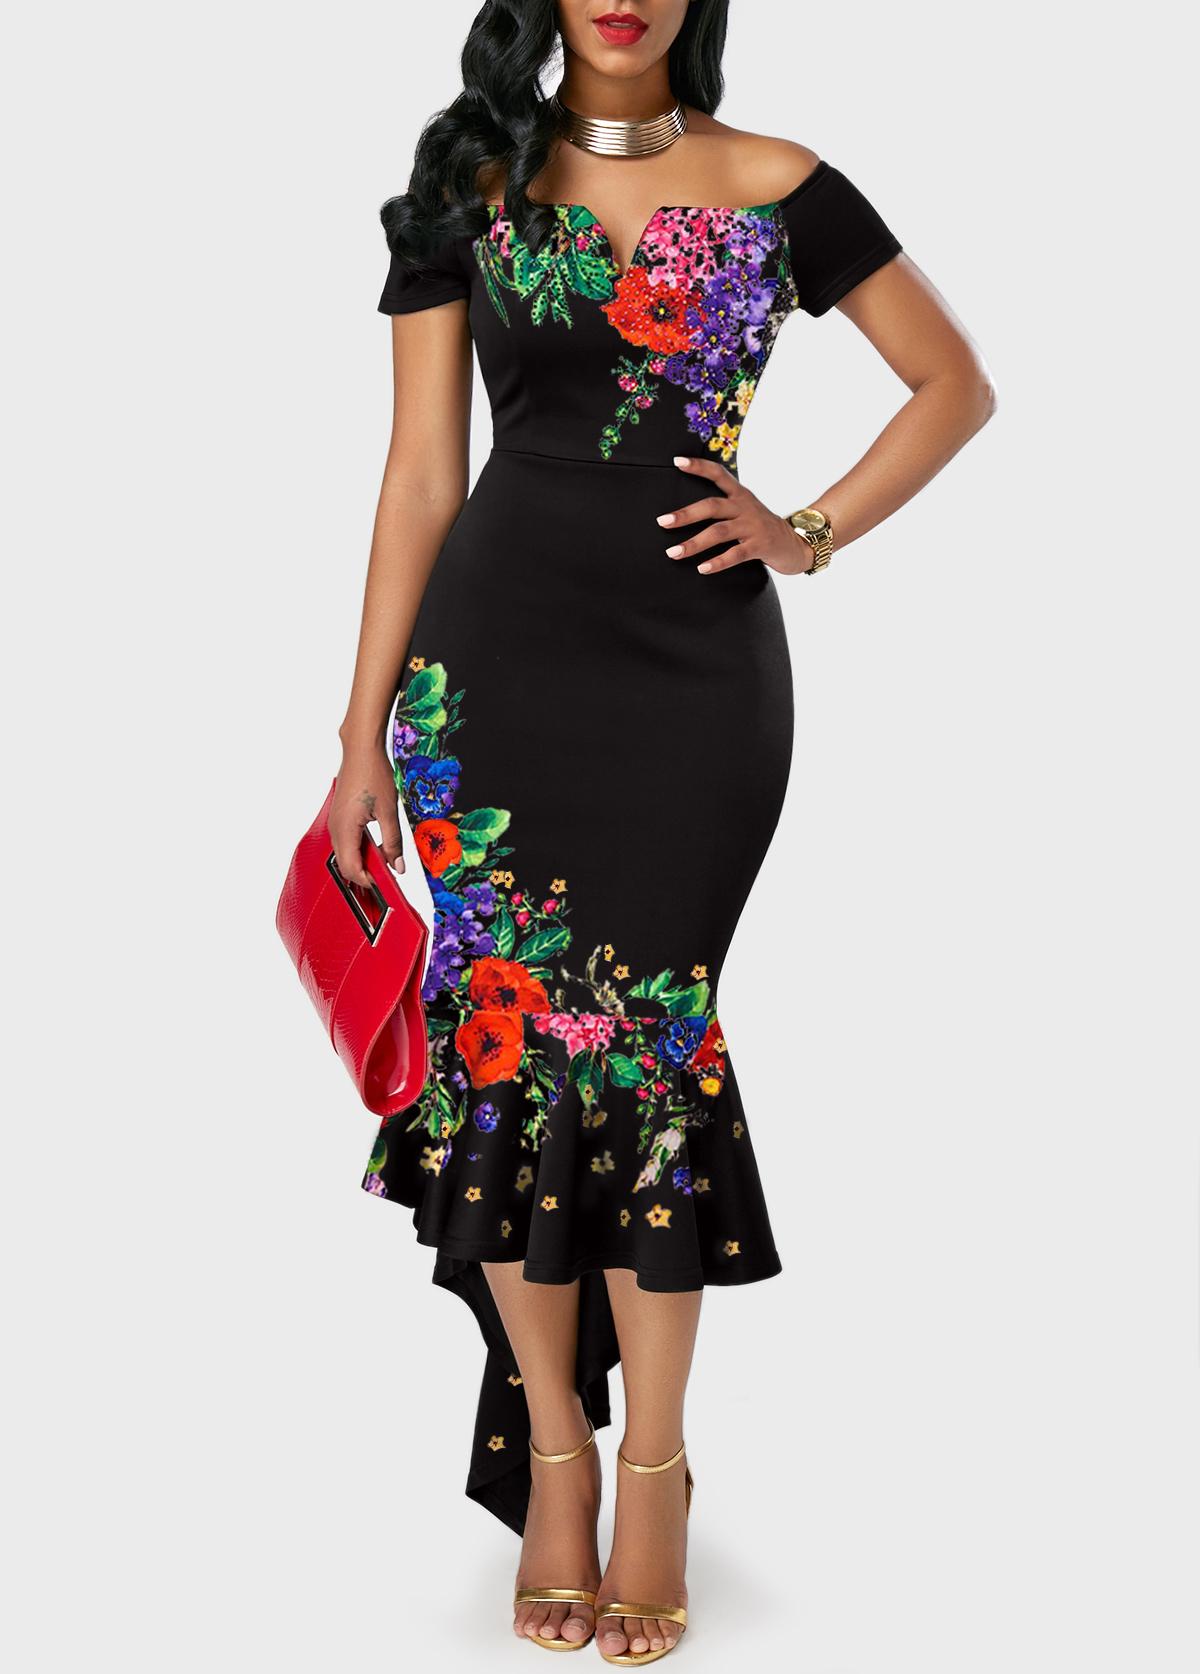 Off the Shoulder Retro Flower Print Black Sheath Dress